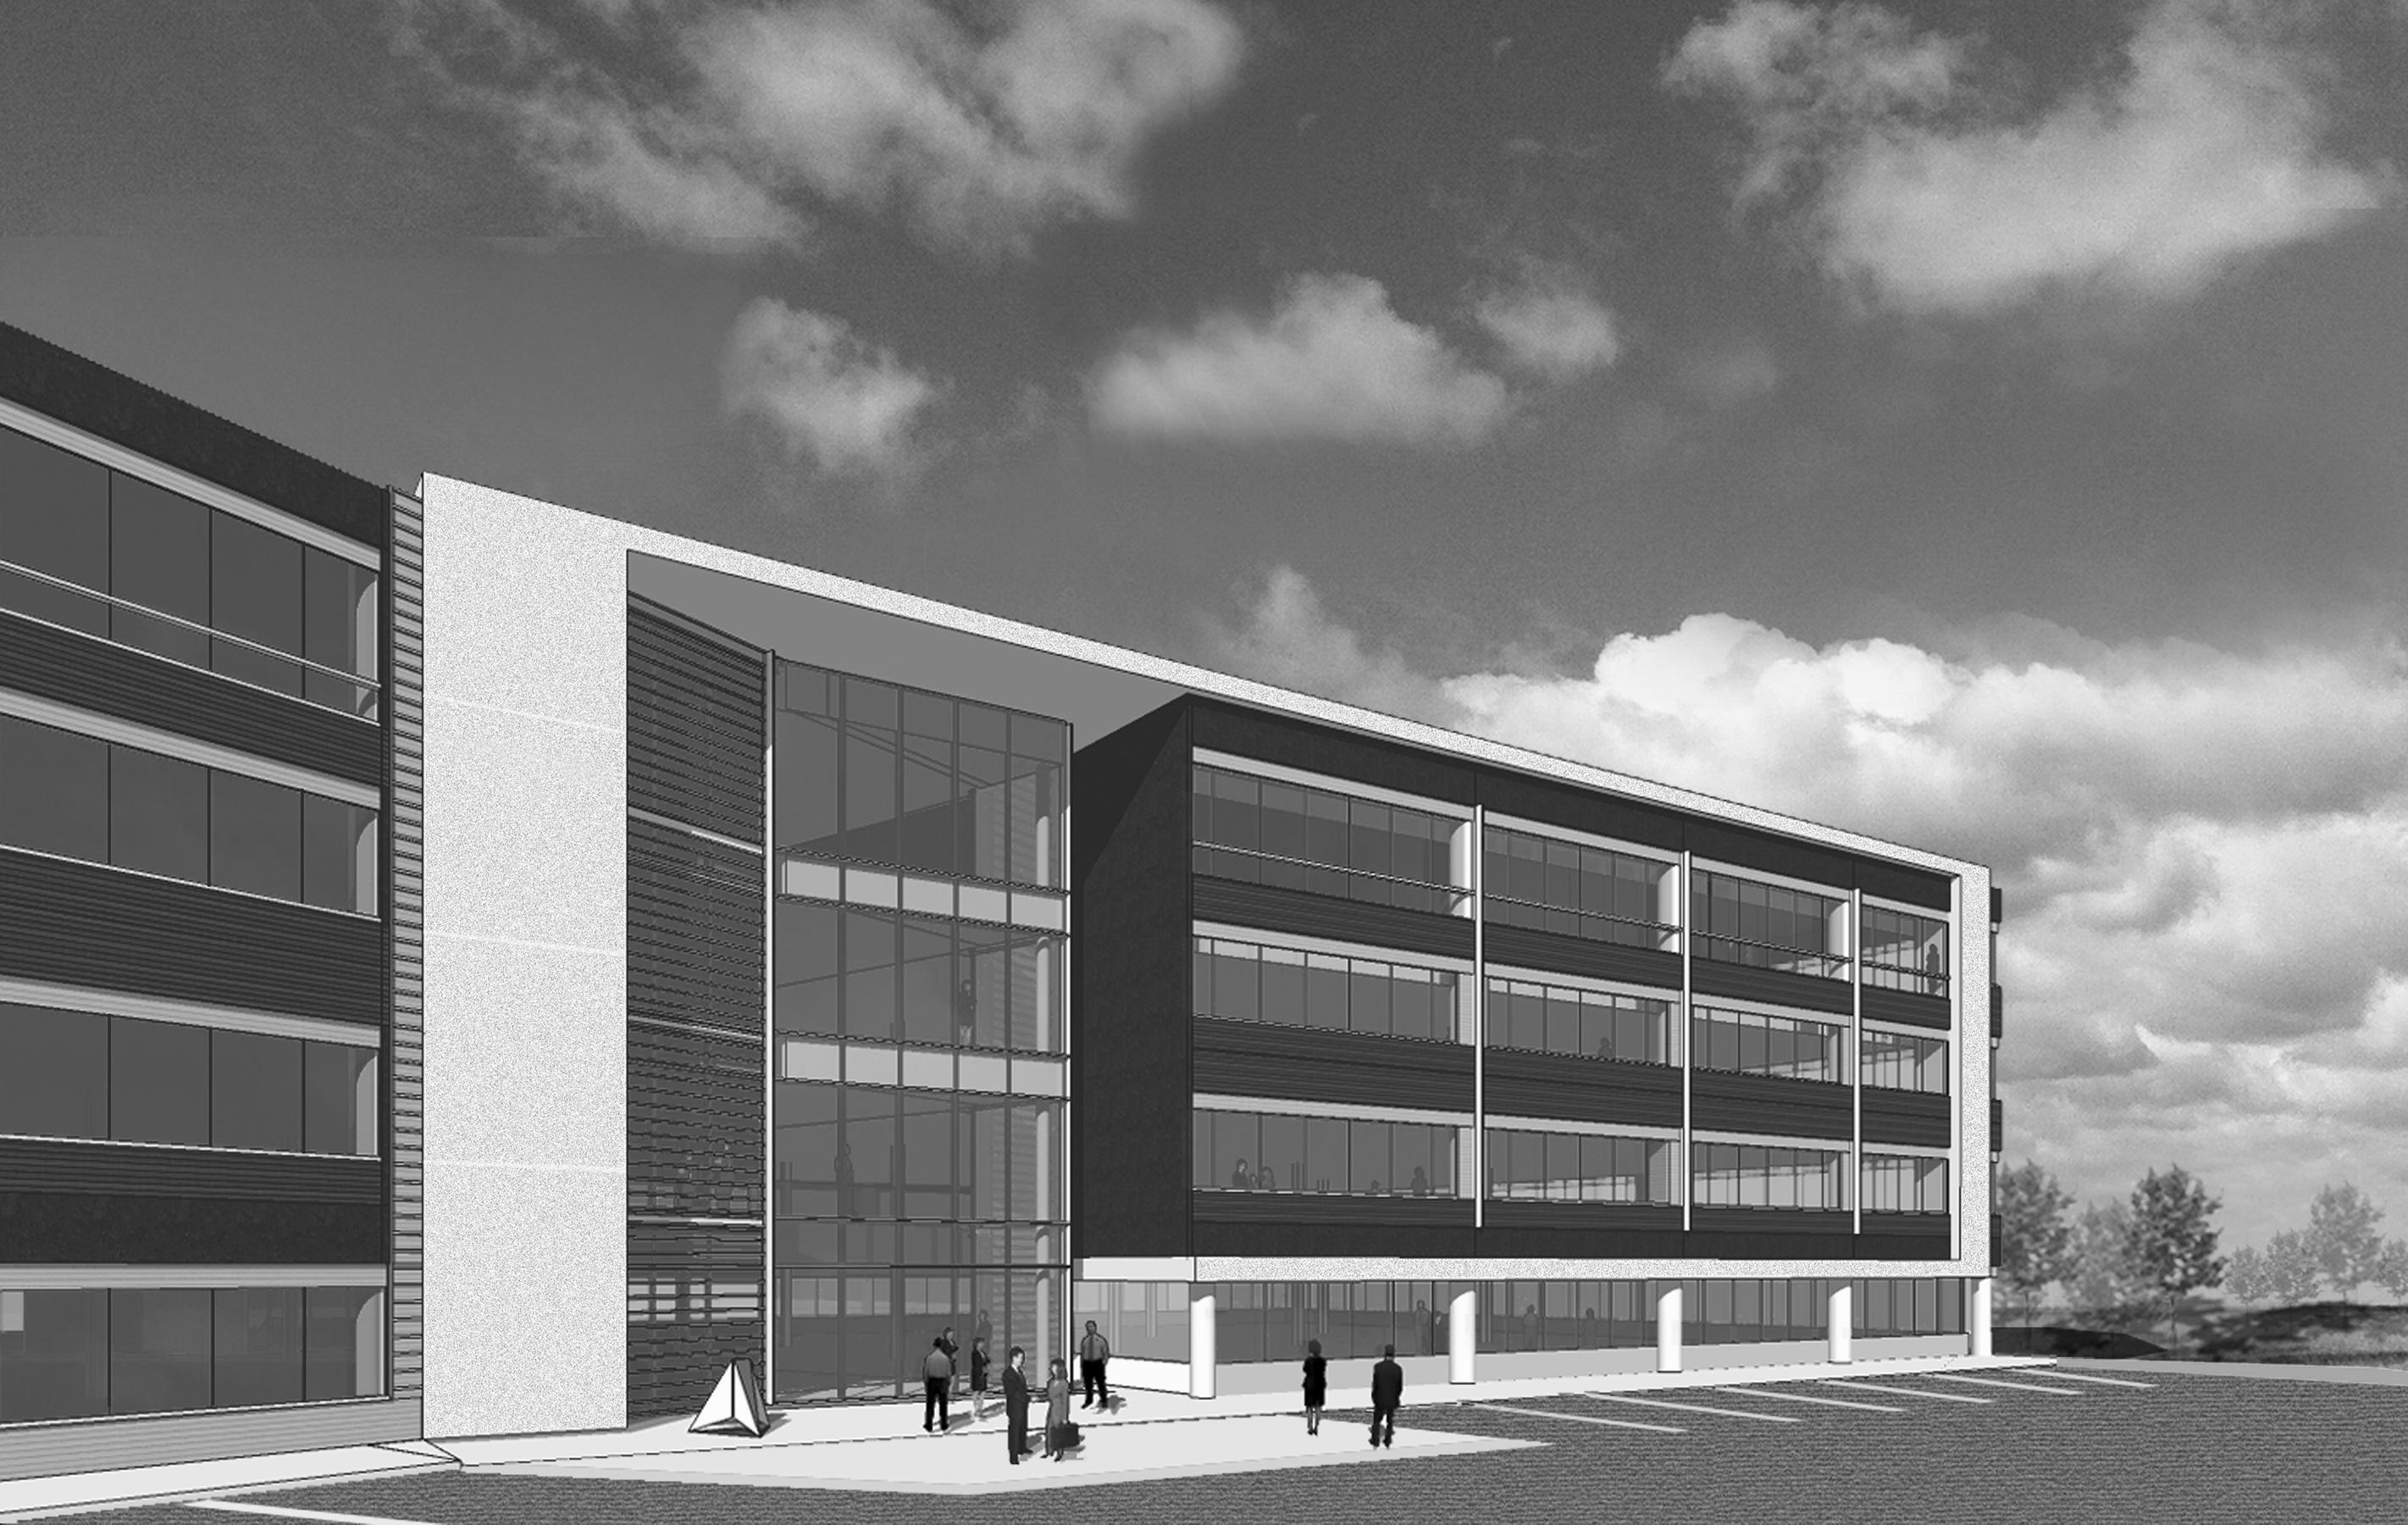 002 open studio architecture Trizzeto Concept entry rendering OSA